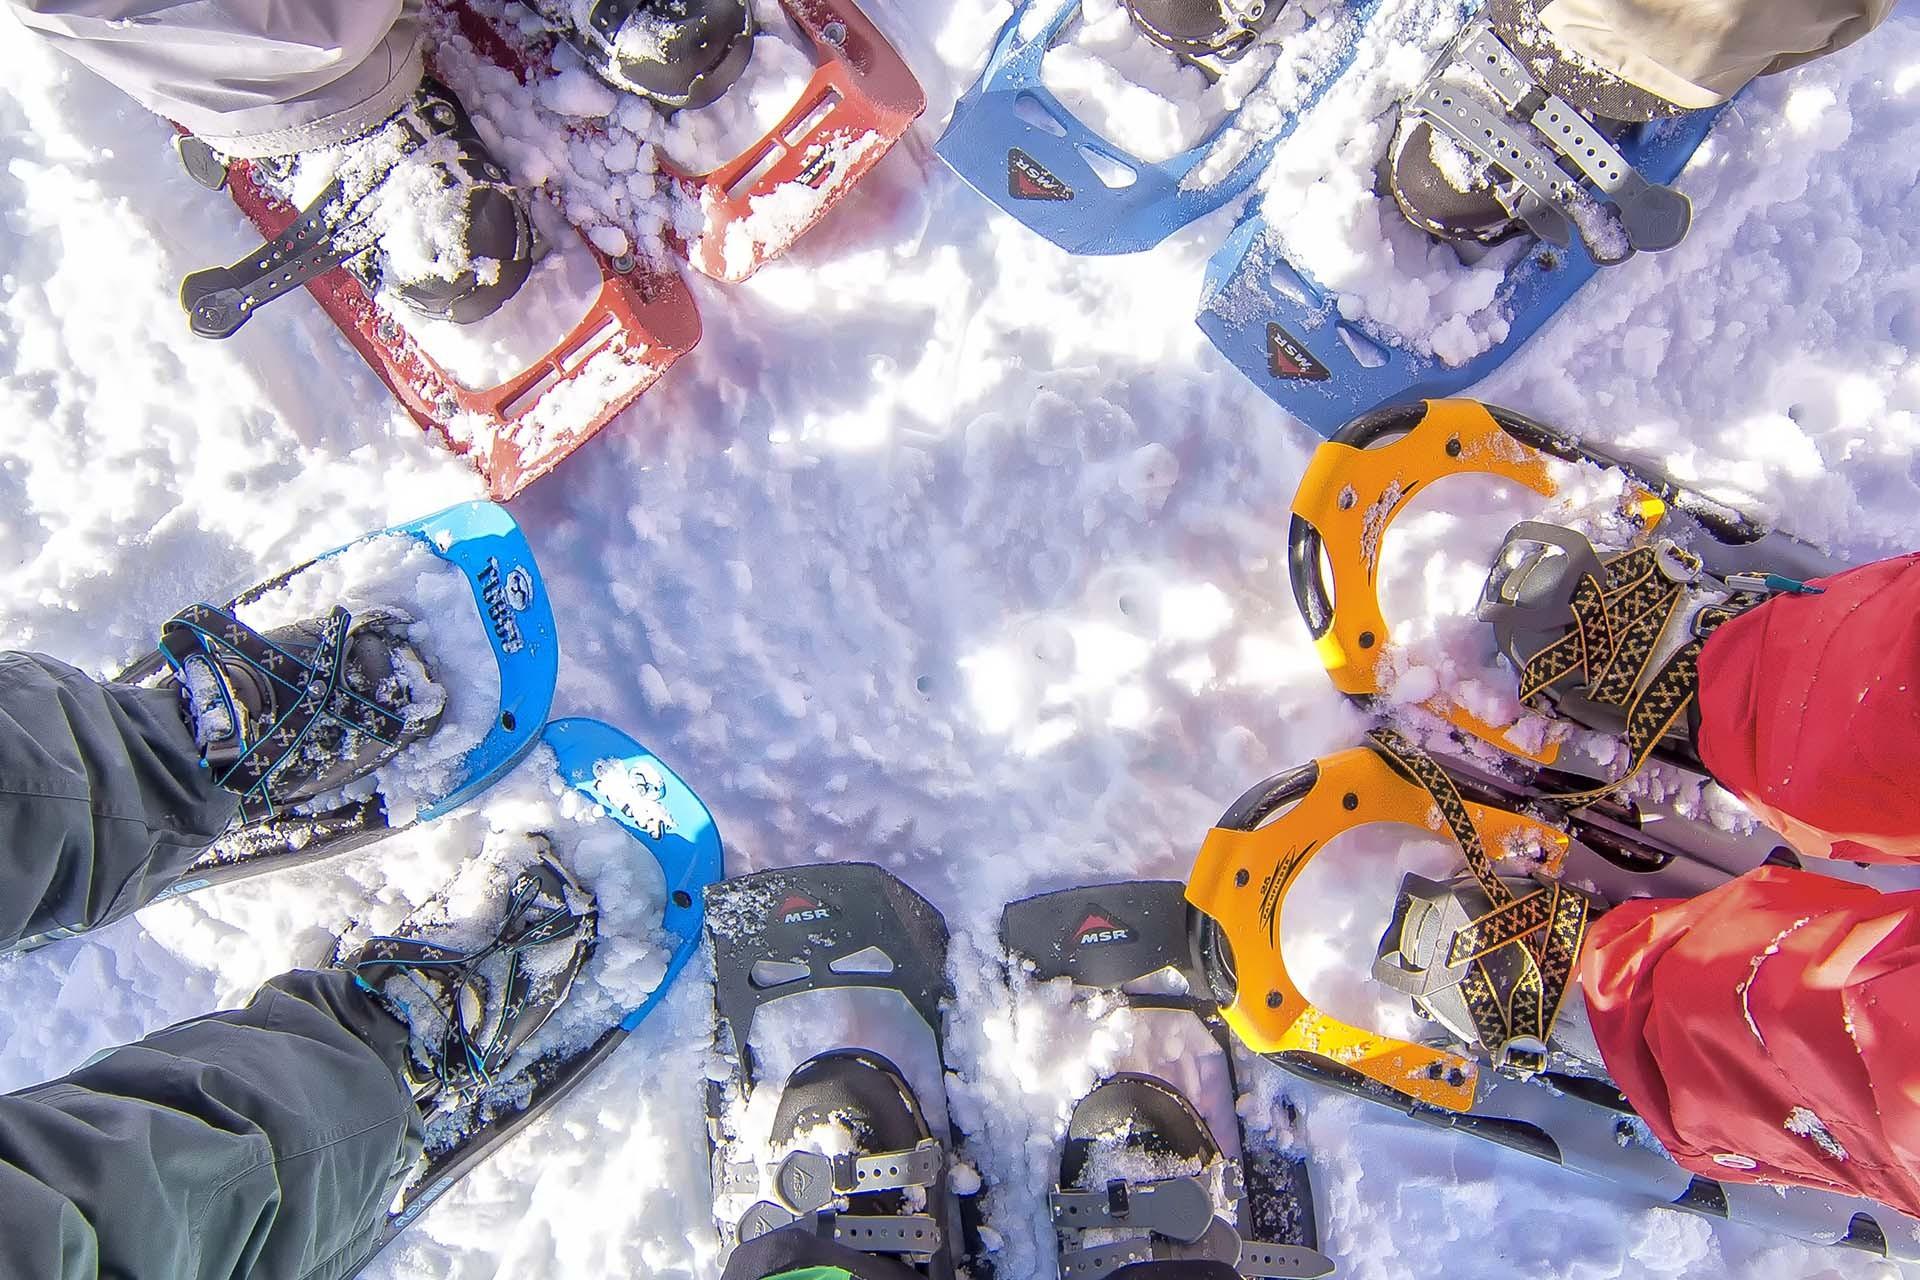 Hikes, snowshoeing